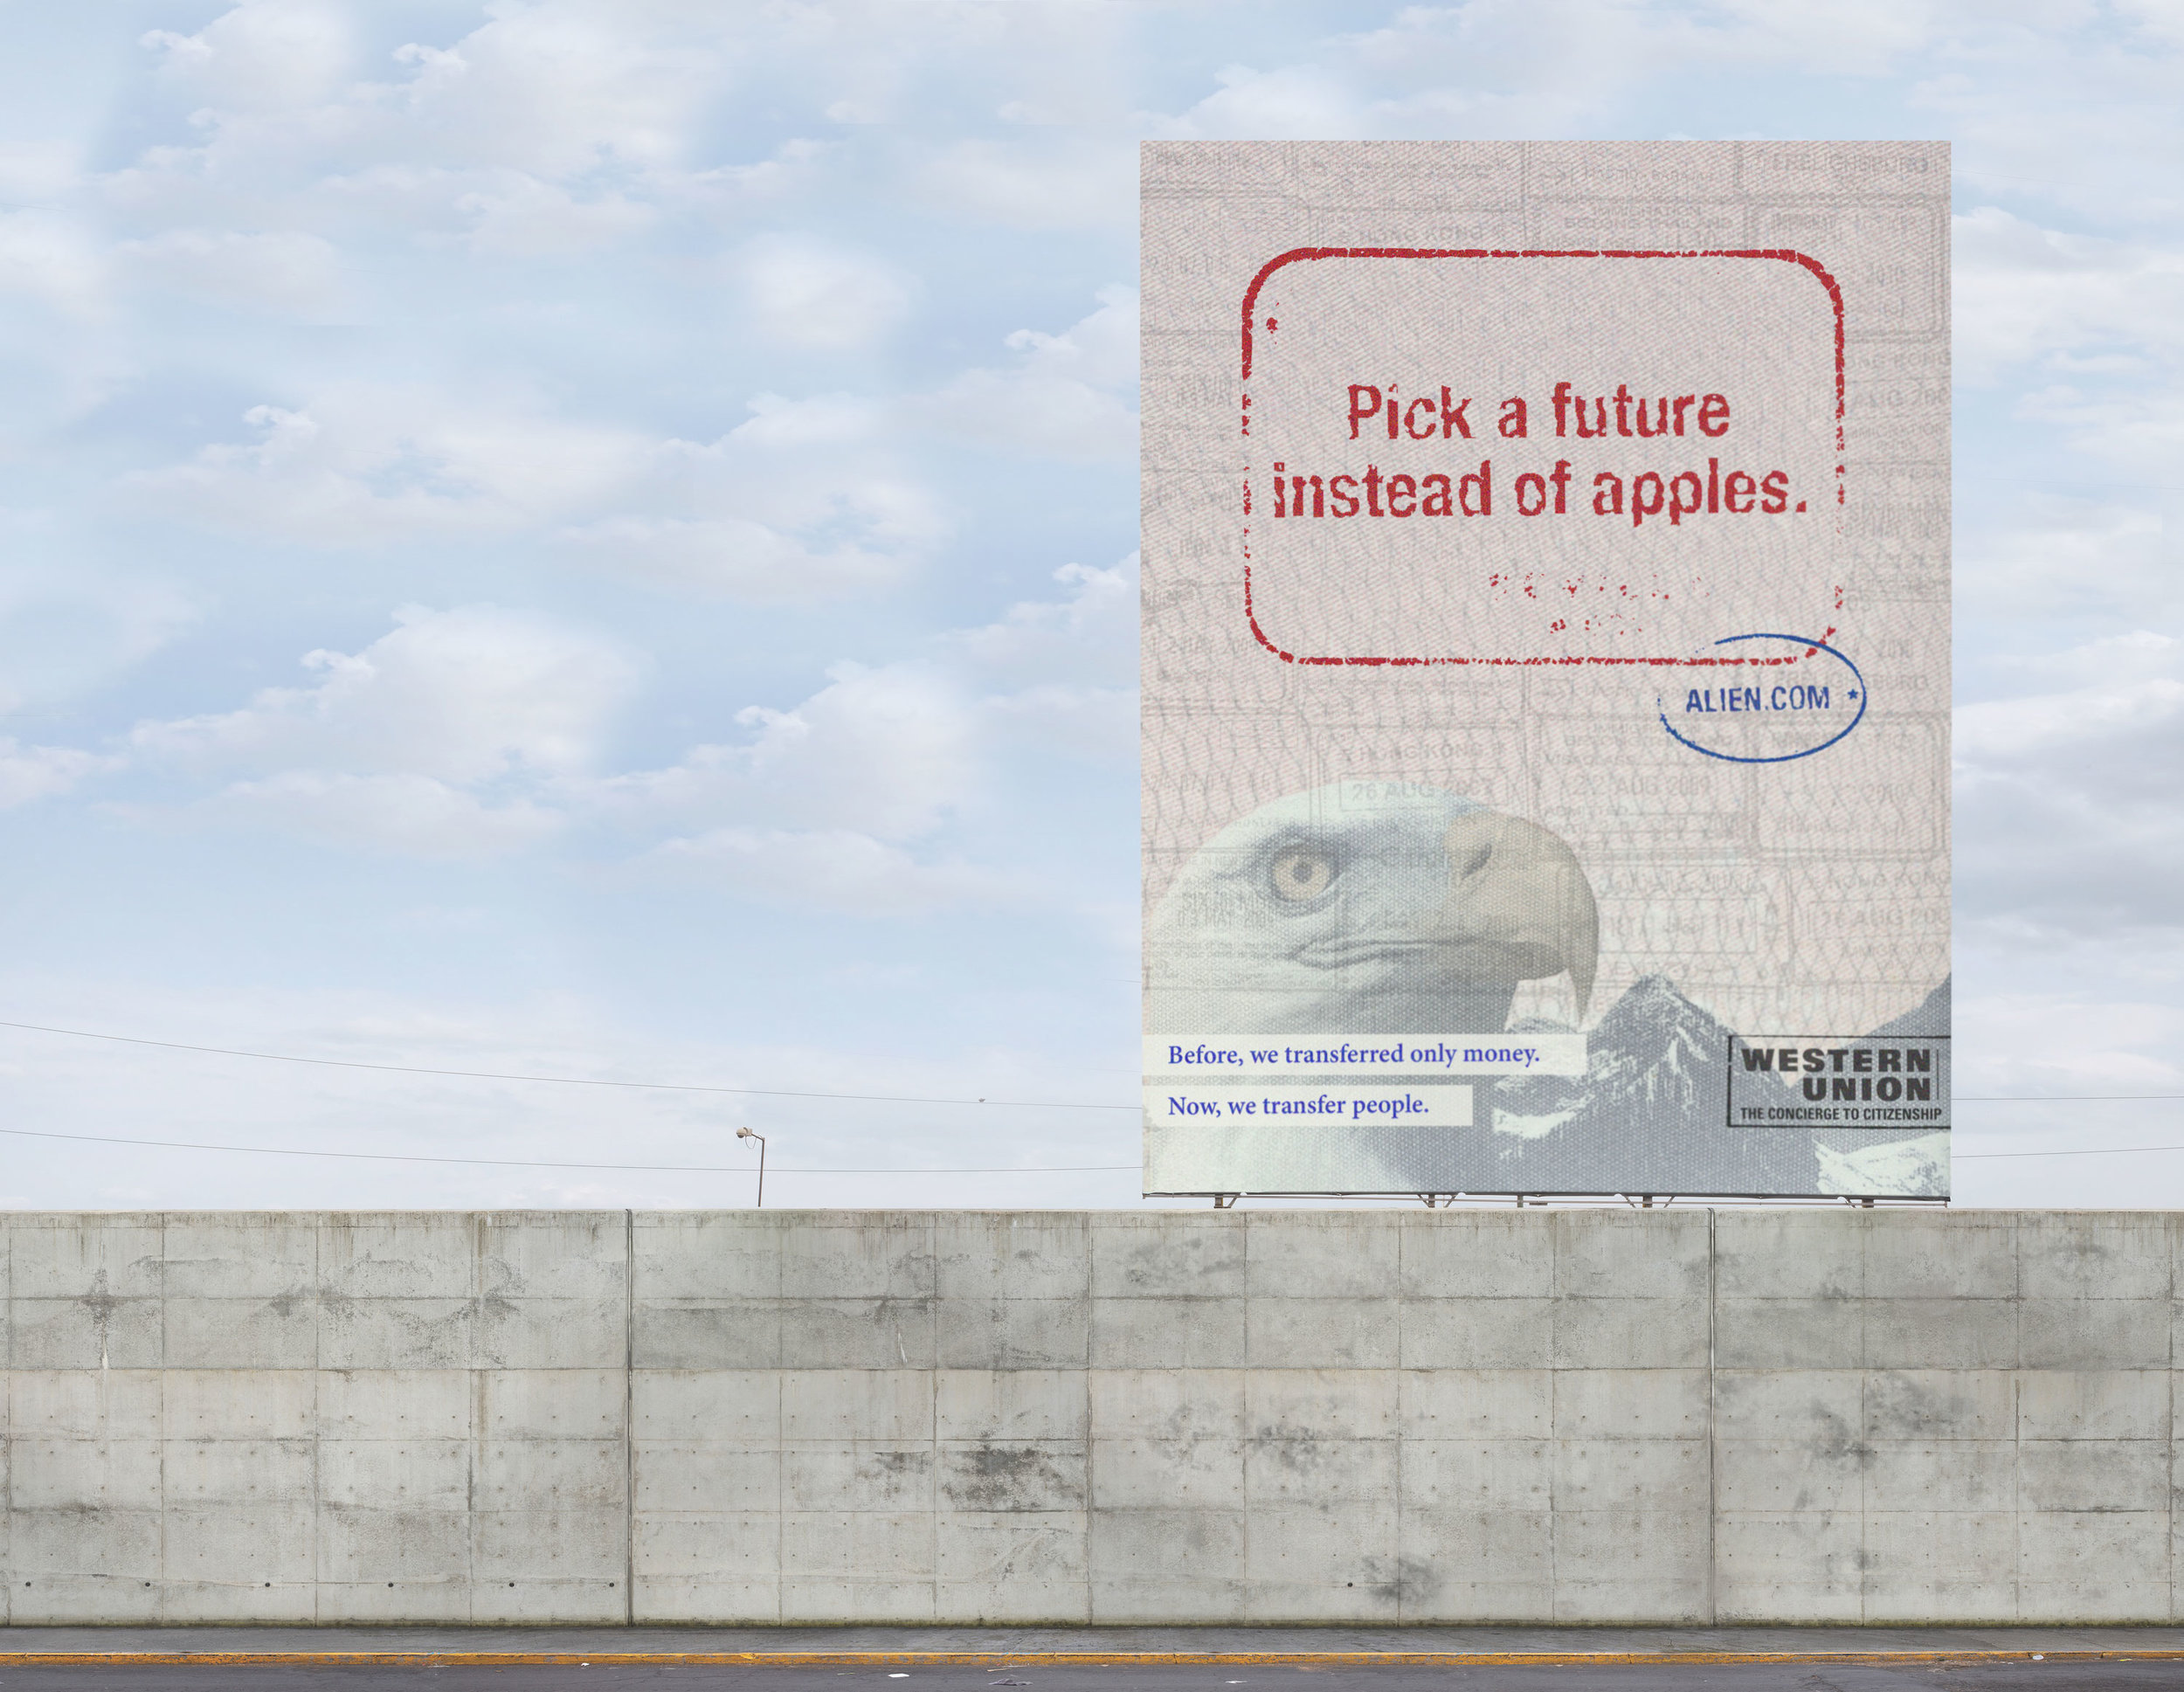 Western-Union-Rebranding-New-Services-Outdoor-Ad-Luis-Fabrega.jpg